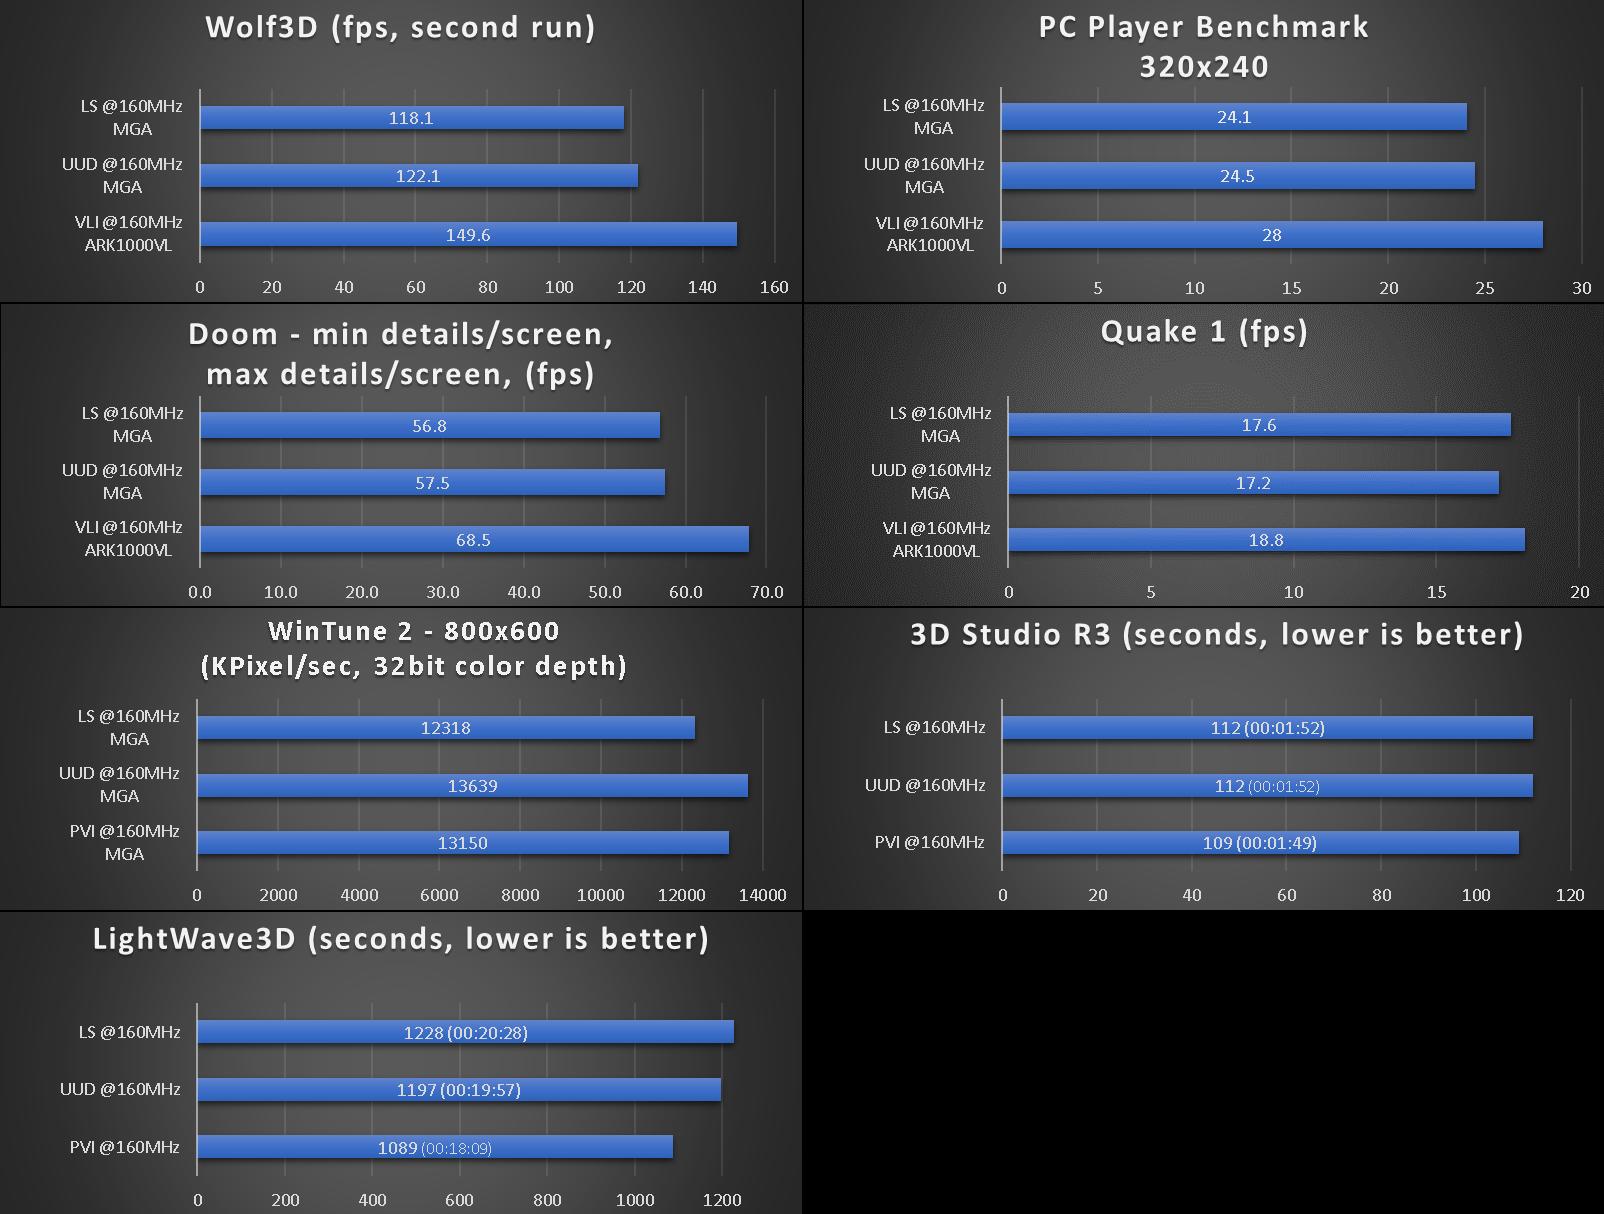 486_ls-486e_rev_d_benchmarks.png